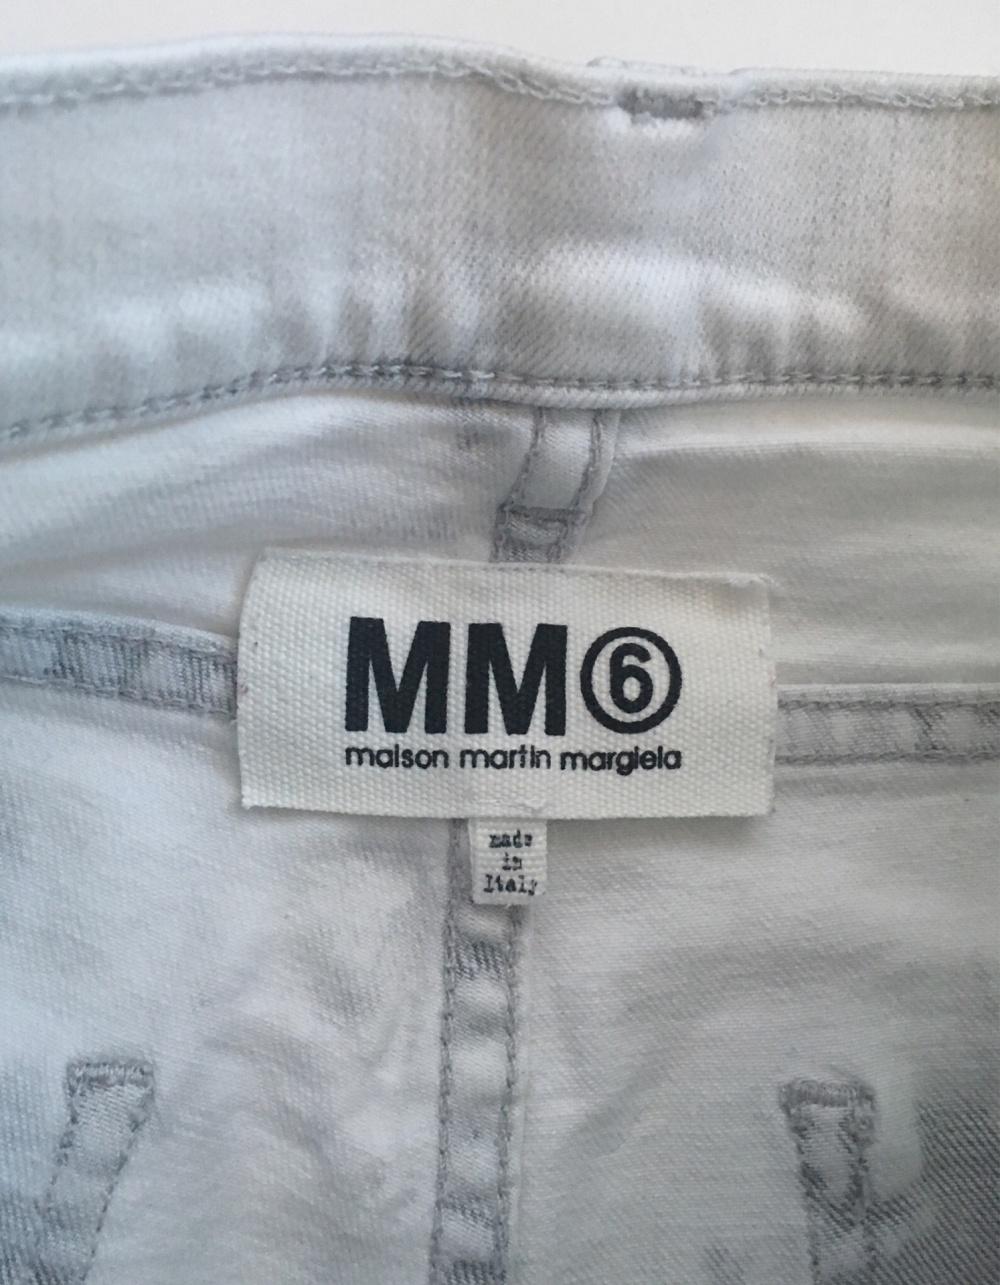 Джинсы MM6 MAISON MARTIN MARGIELA , 26 размер